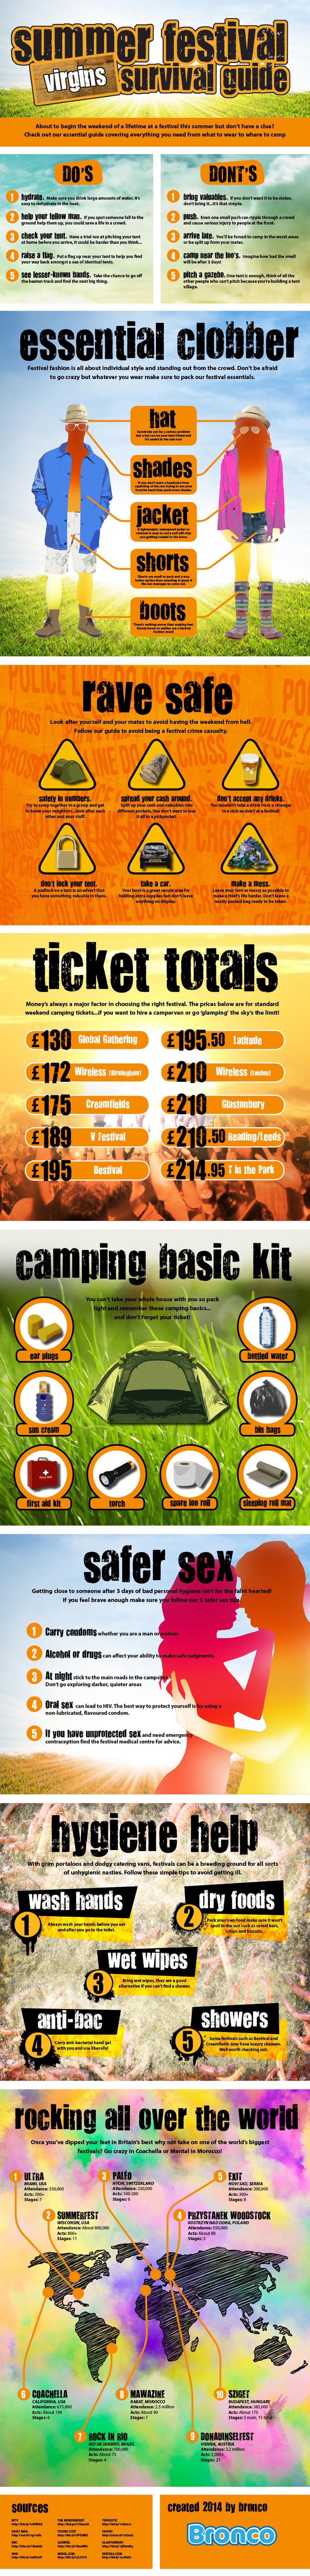 summer-festival-survival-guide